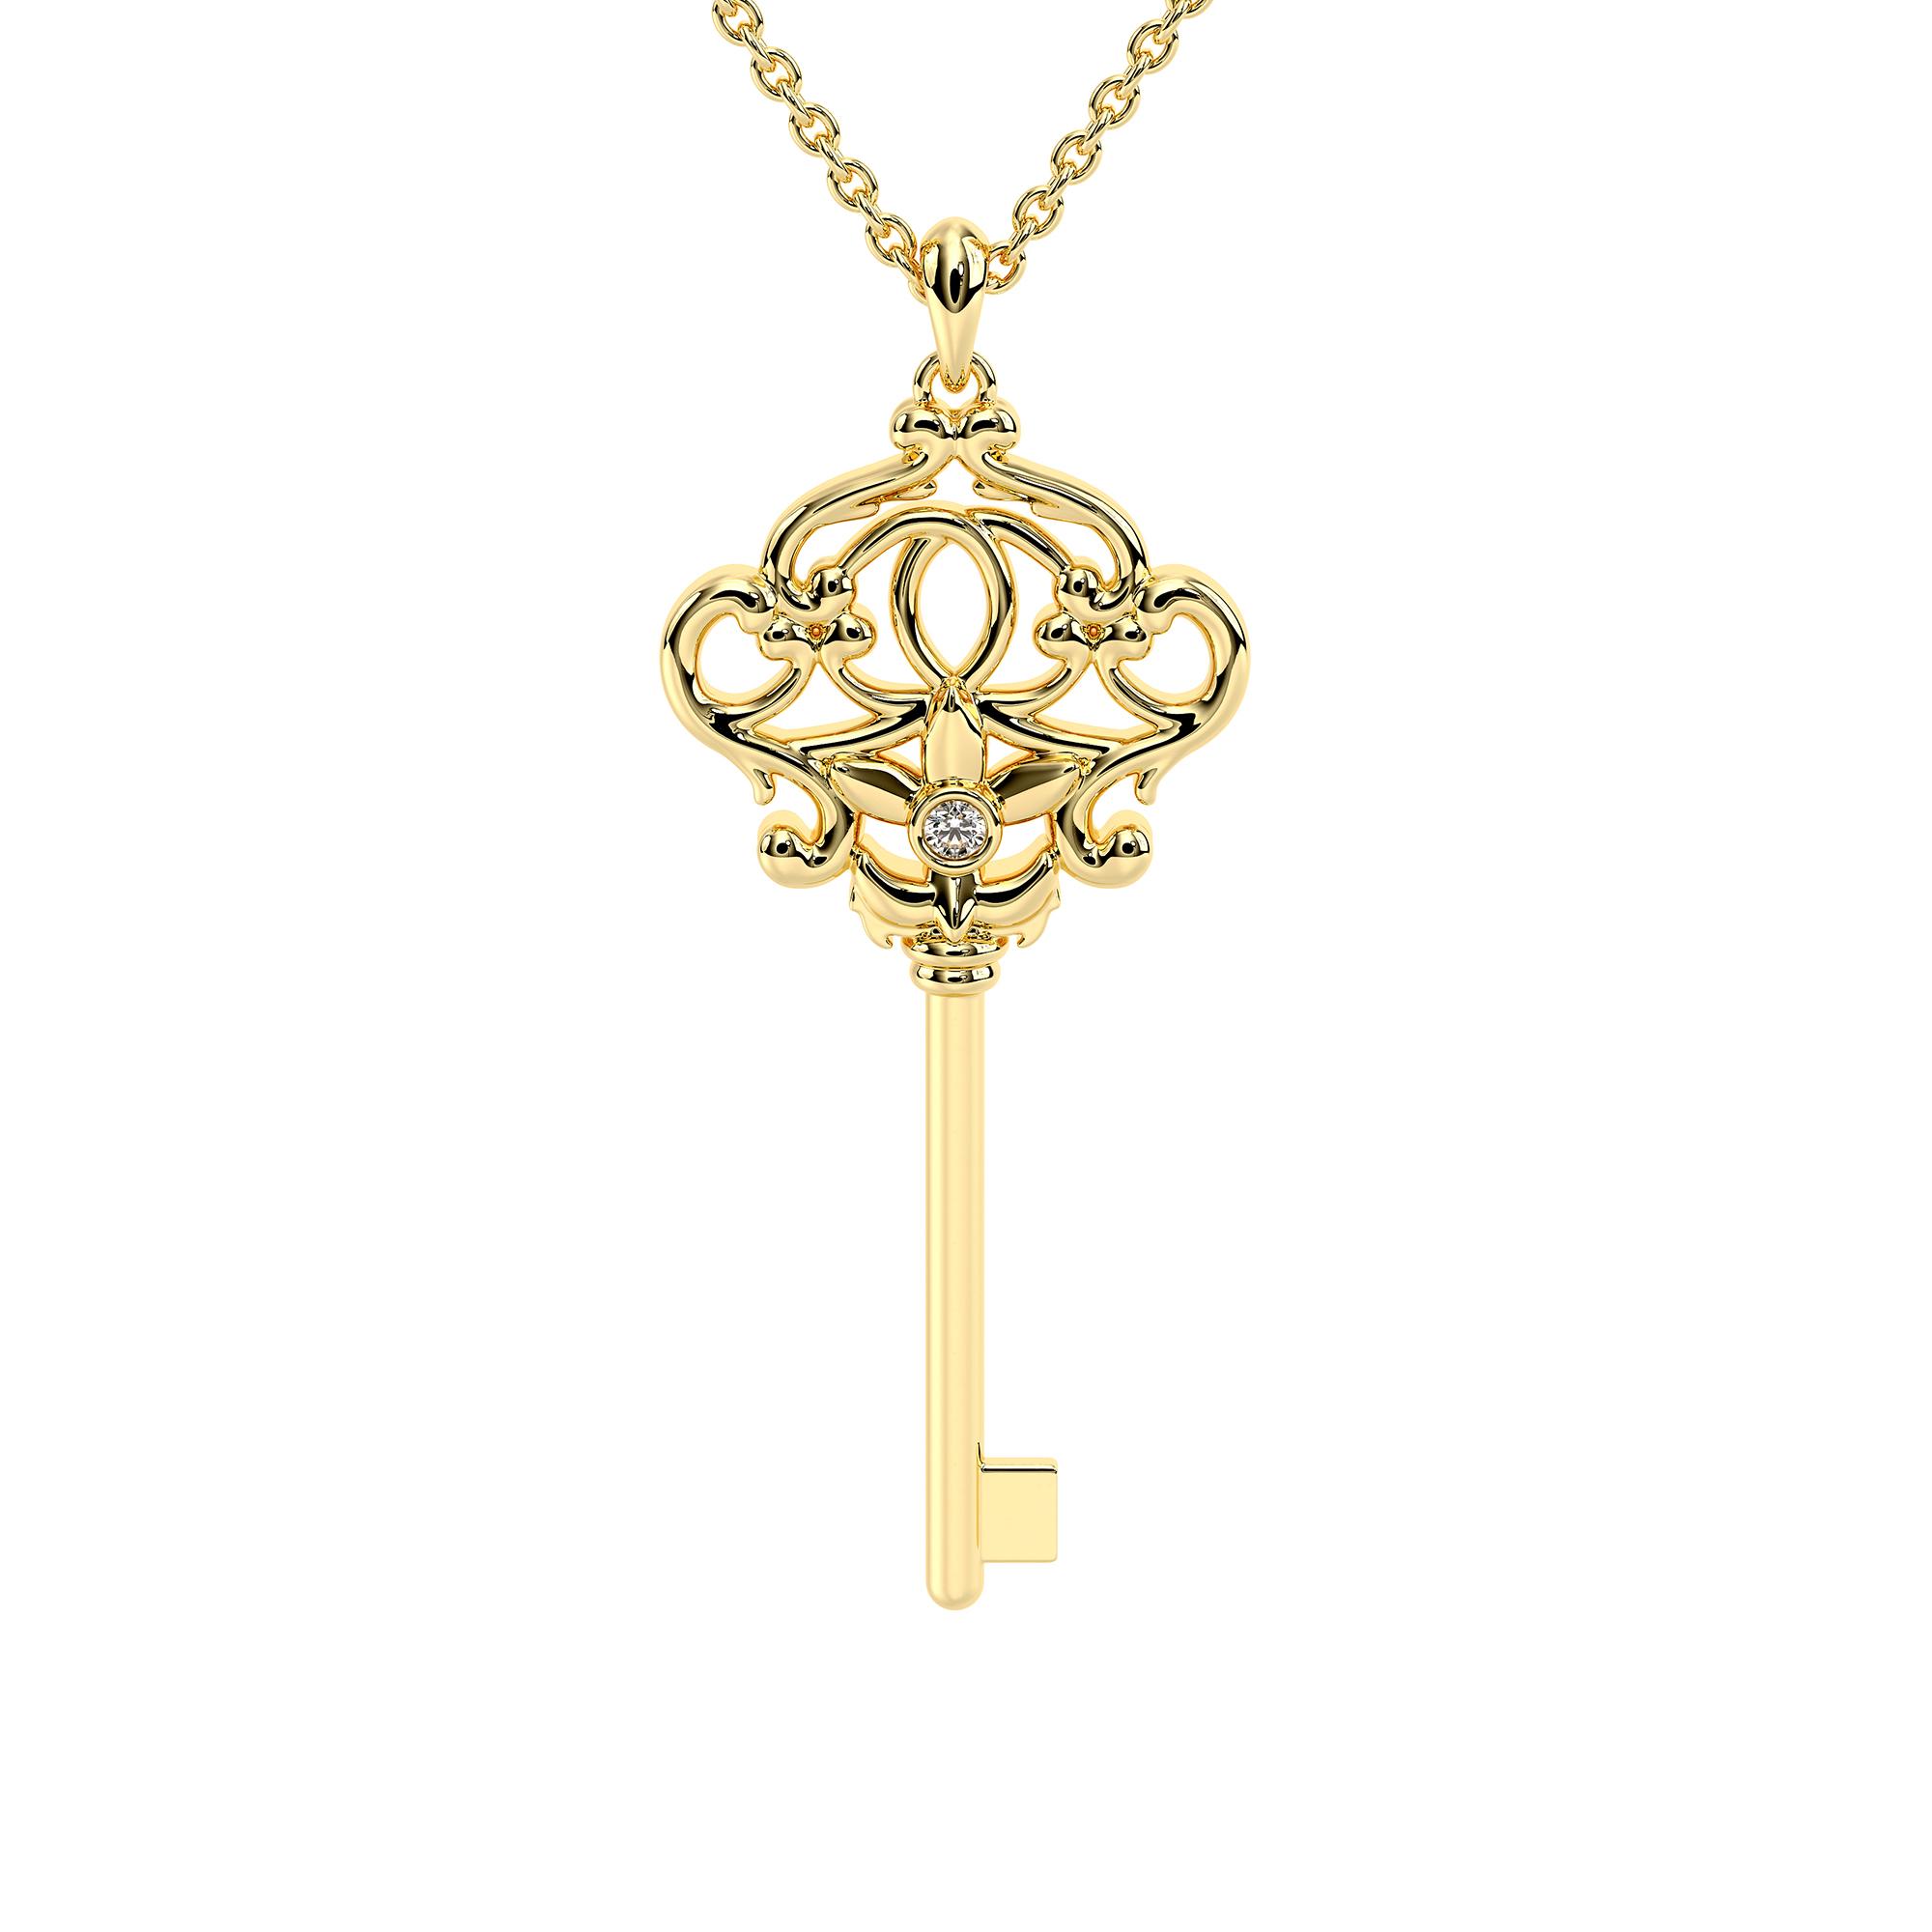 Diamond Key Pendant Yellow Gold Necklace Art Deco Style Pendant Unique Gift For Her